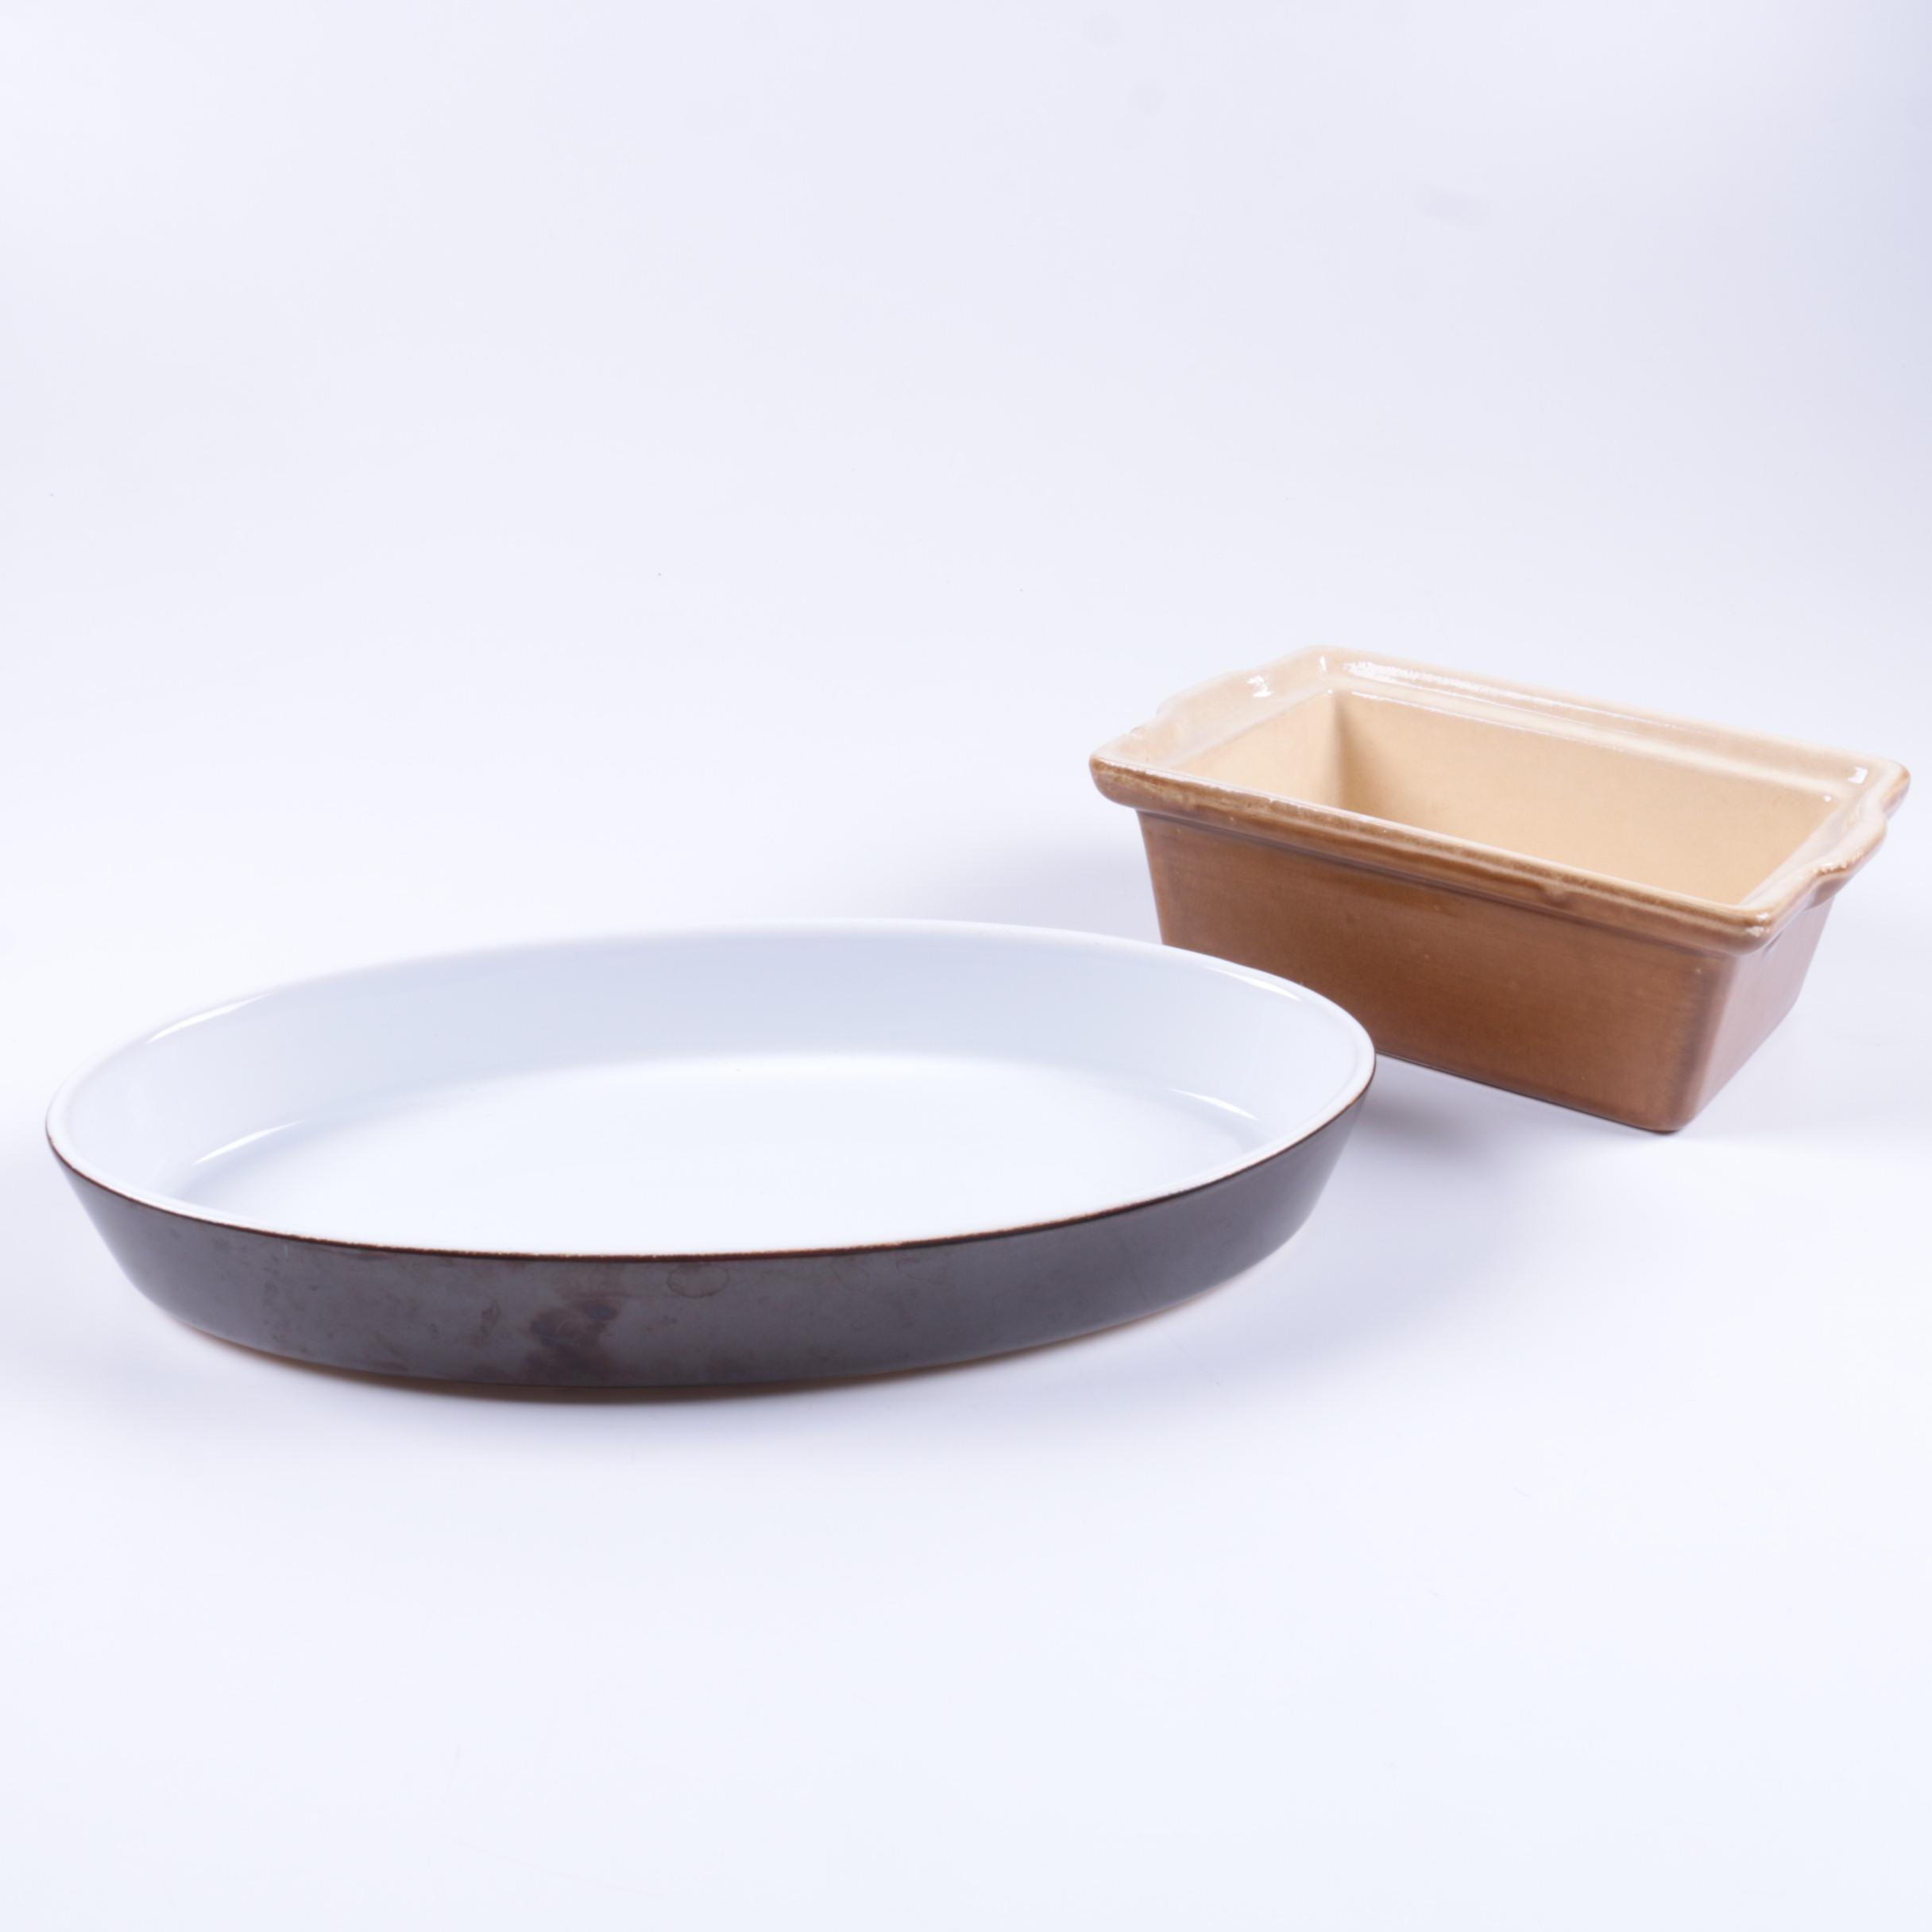 Stone Bakeware Including T. G. Green Ltd.